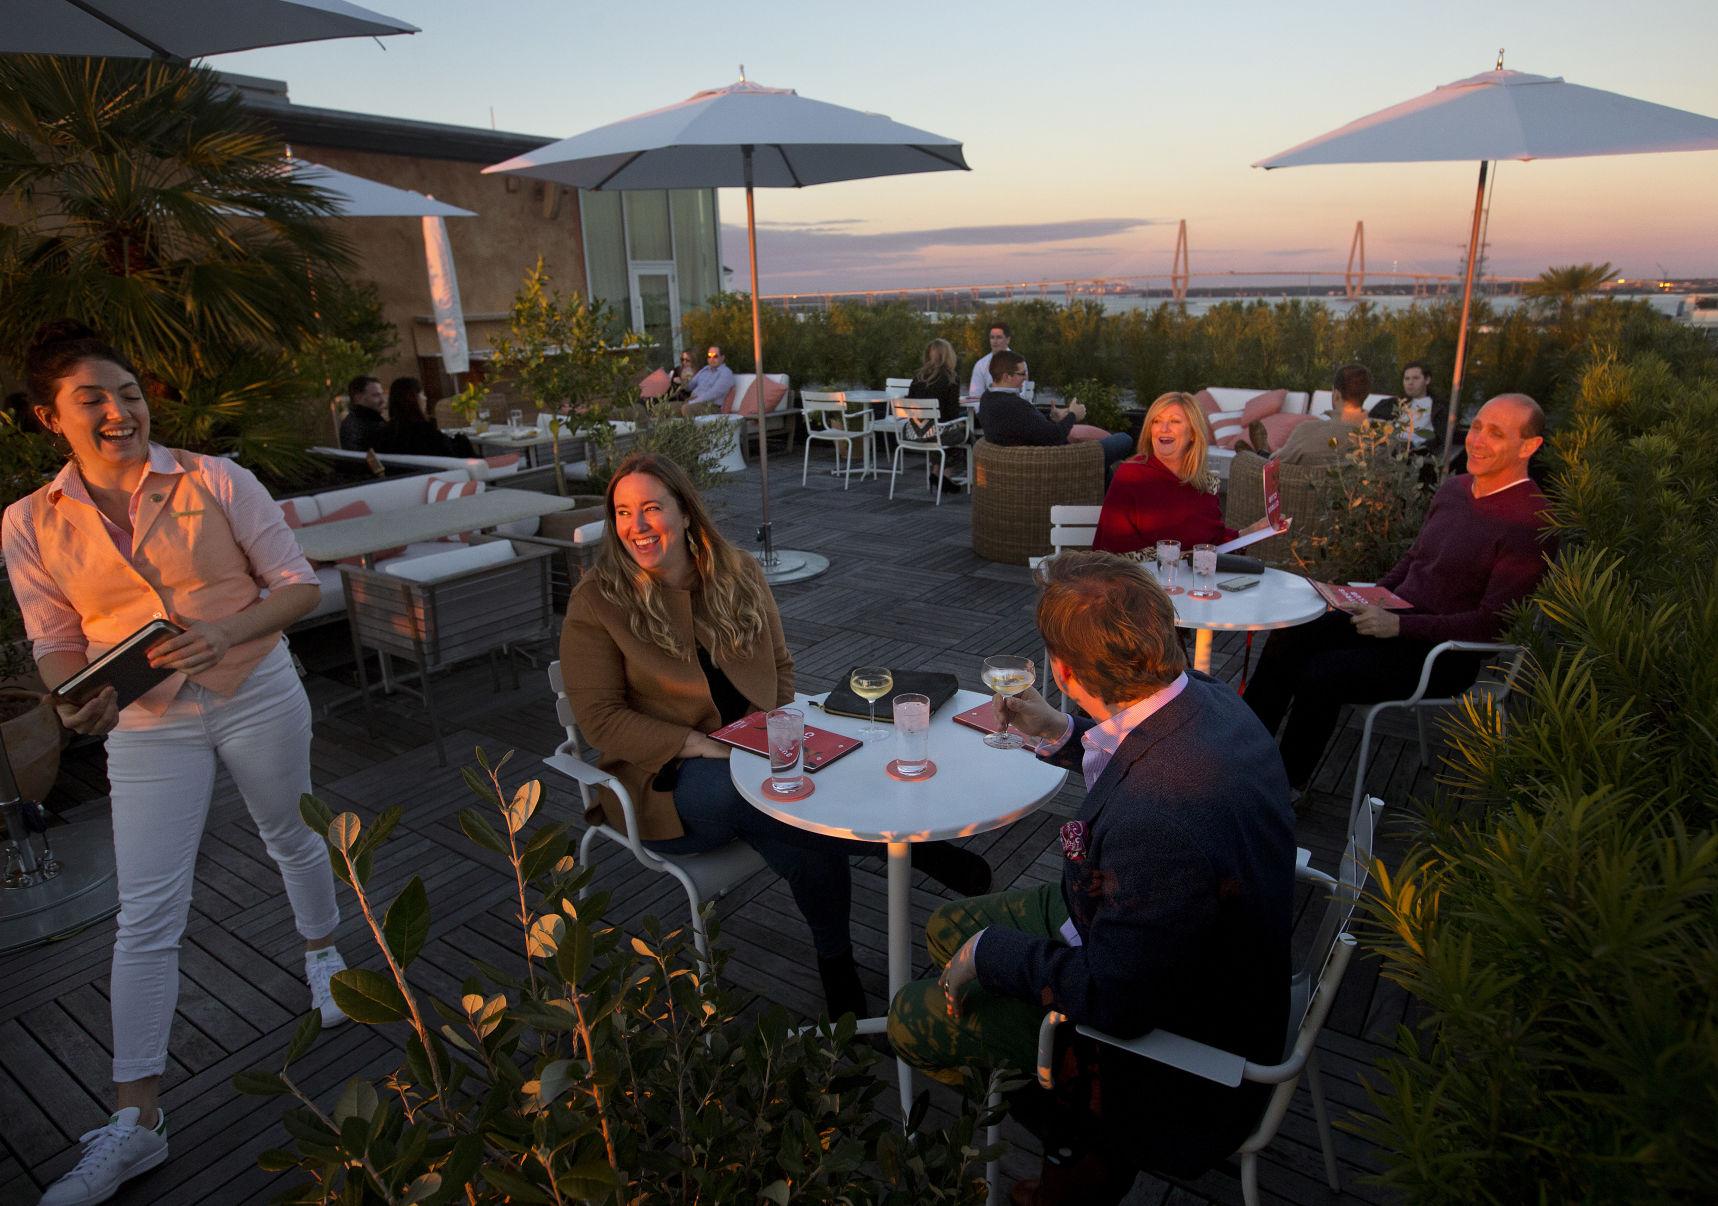 19 Charleston-area rooftop bar and restaurant recommendations for spring & 19 Charleston-area rooftop bar and restaurant recommendations for ...